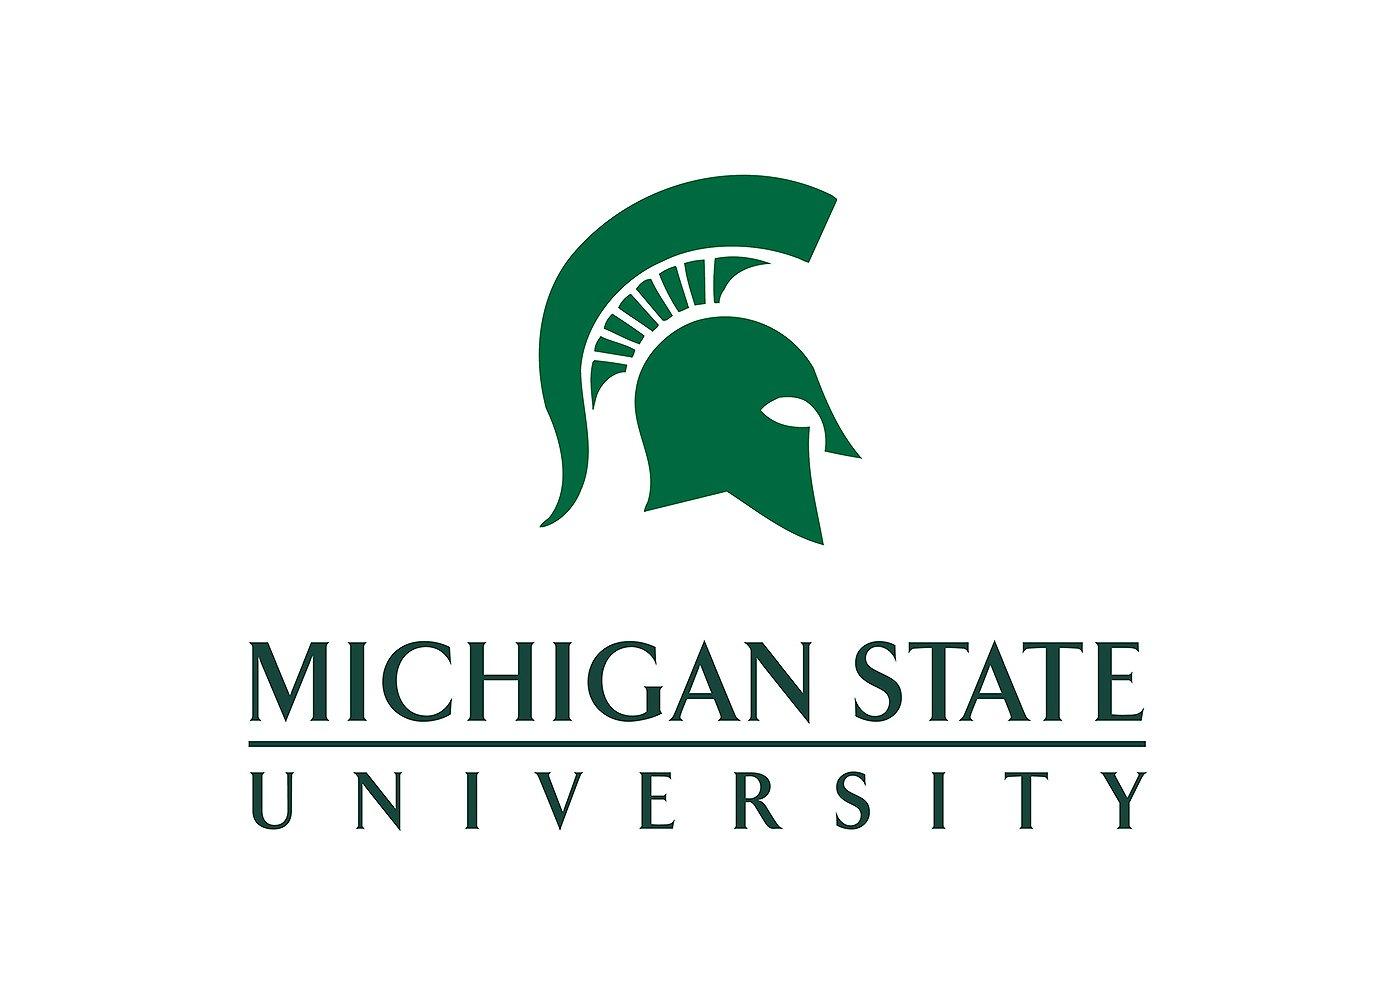 Michigan Logo, Michigan Symbol, Meaning, History and Evolution